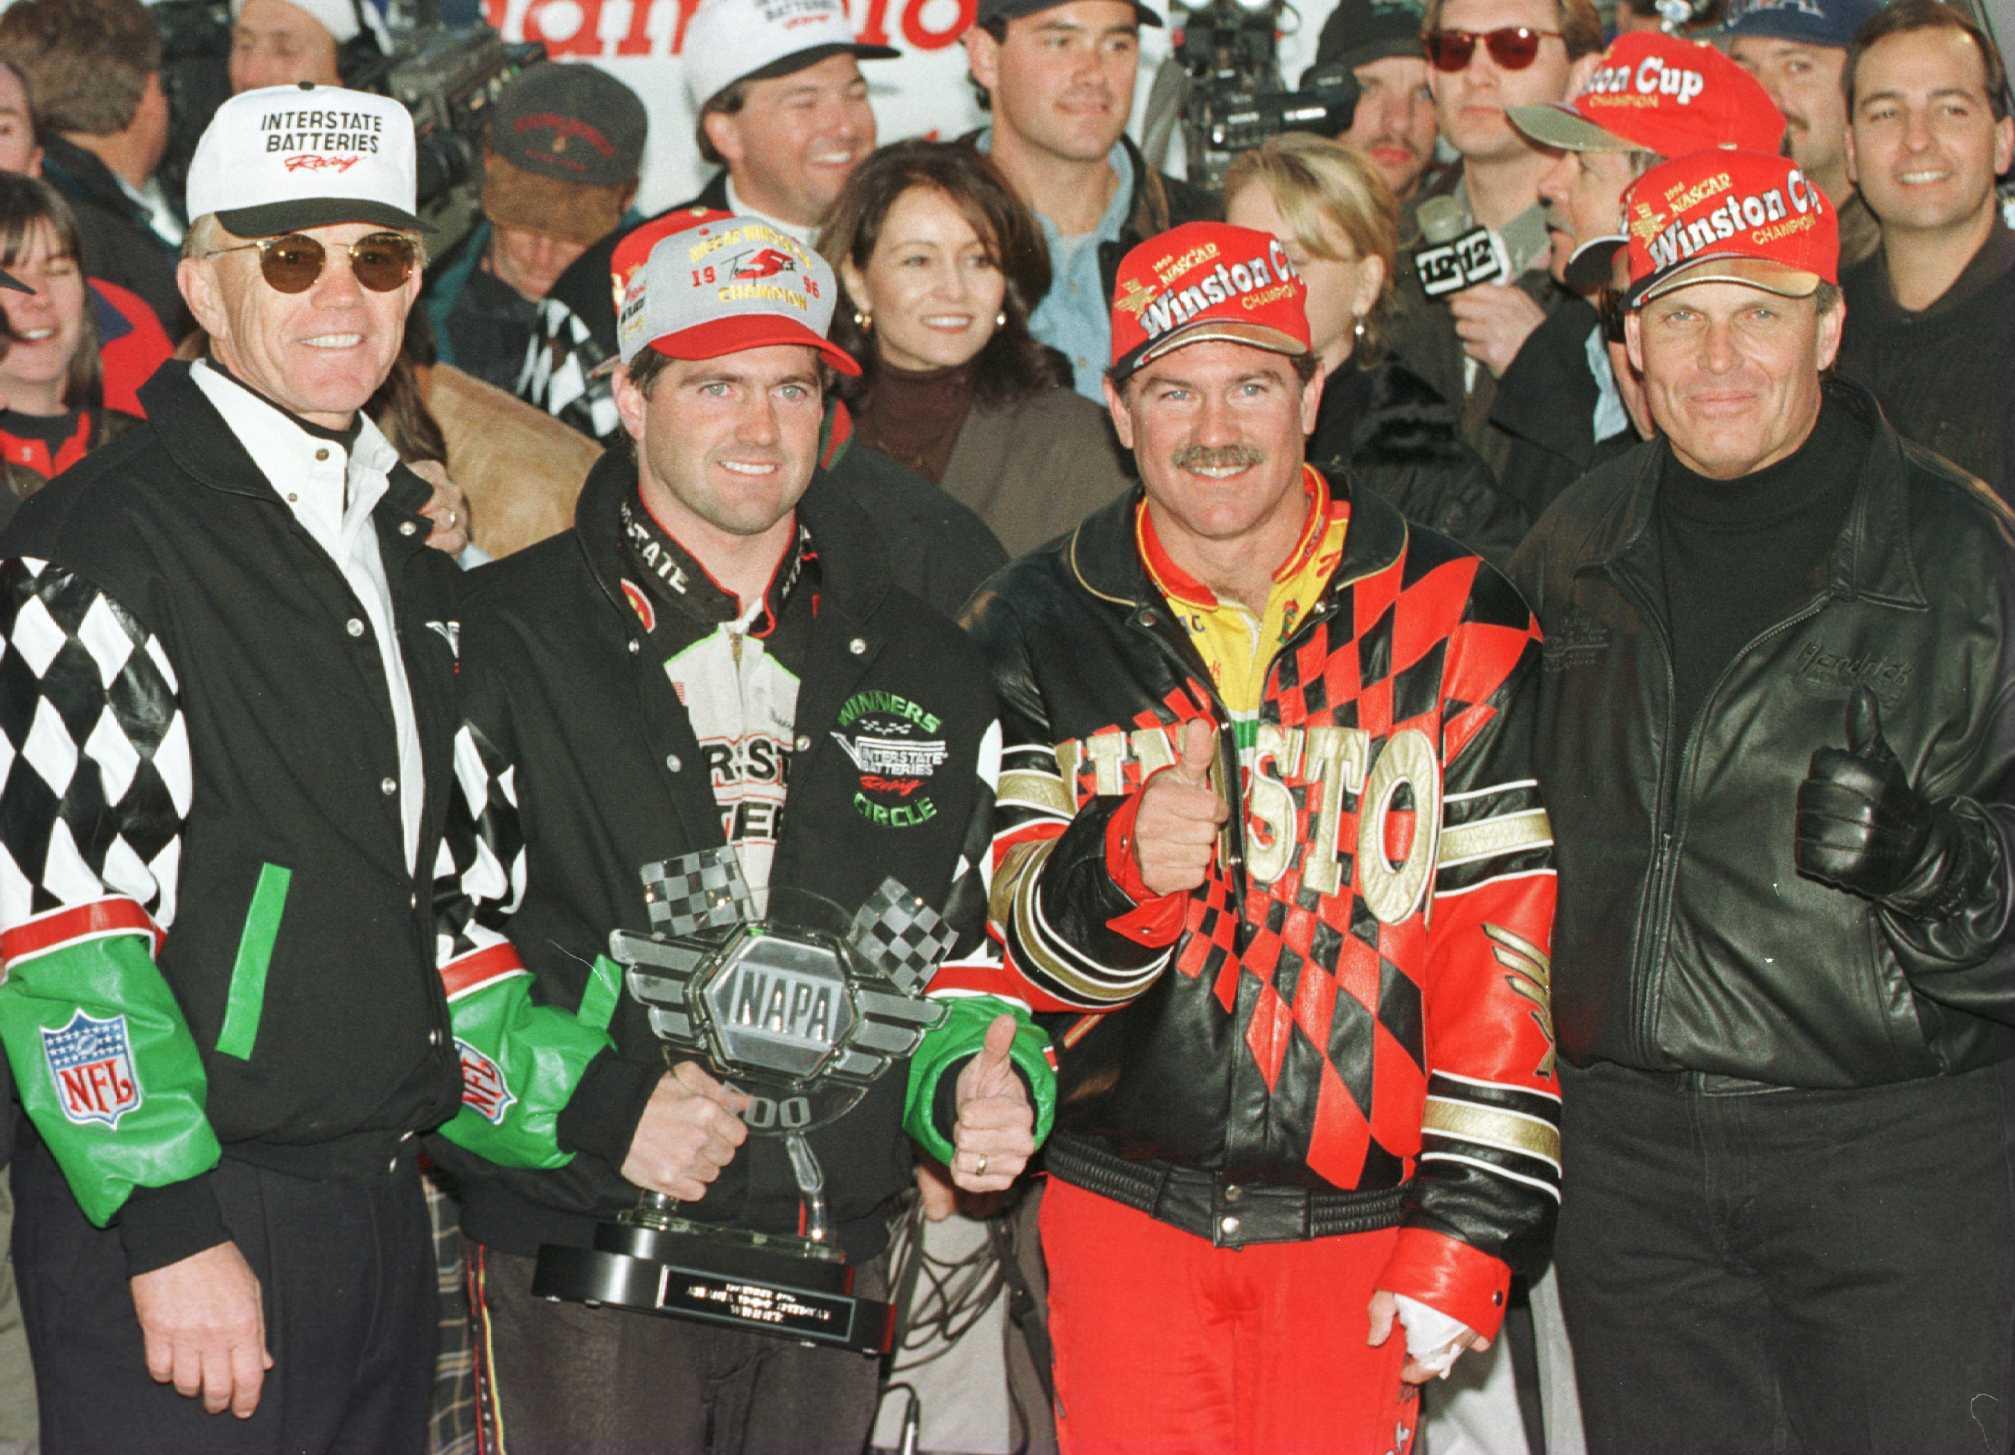 Joe Gibbs & Rick Hendrick Have Done Battle for NASCAR Titles in Past but Hendrick has more NASCAR hardware.